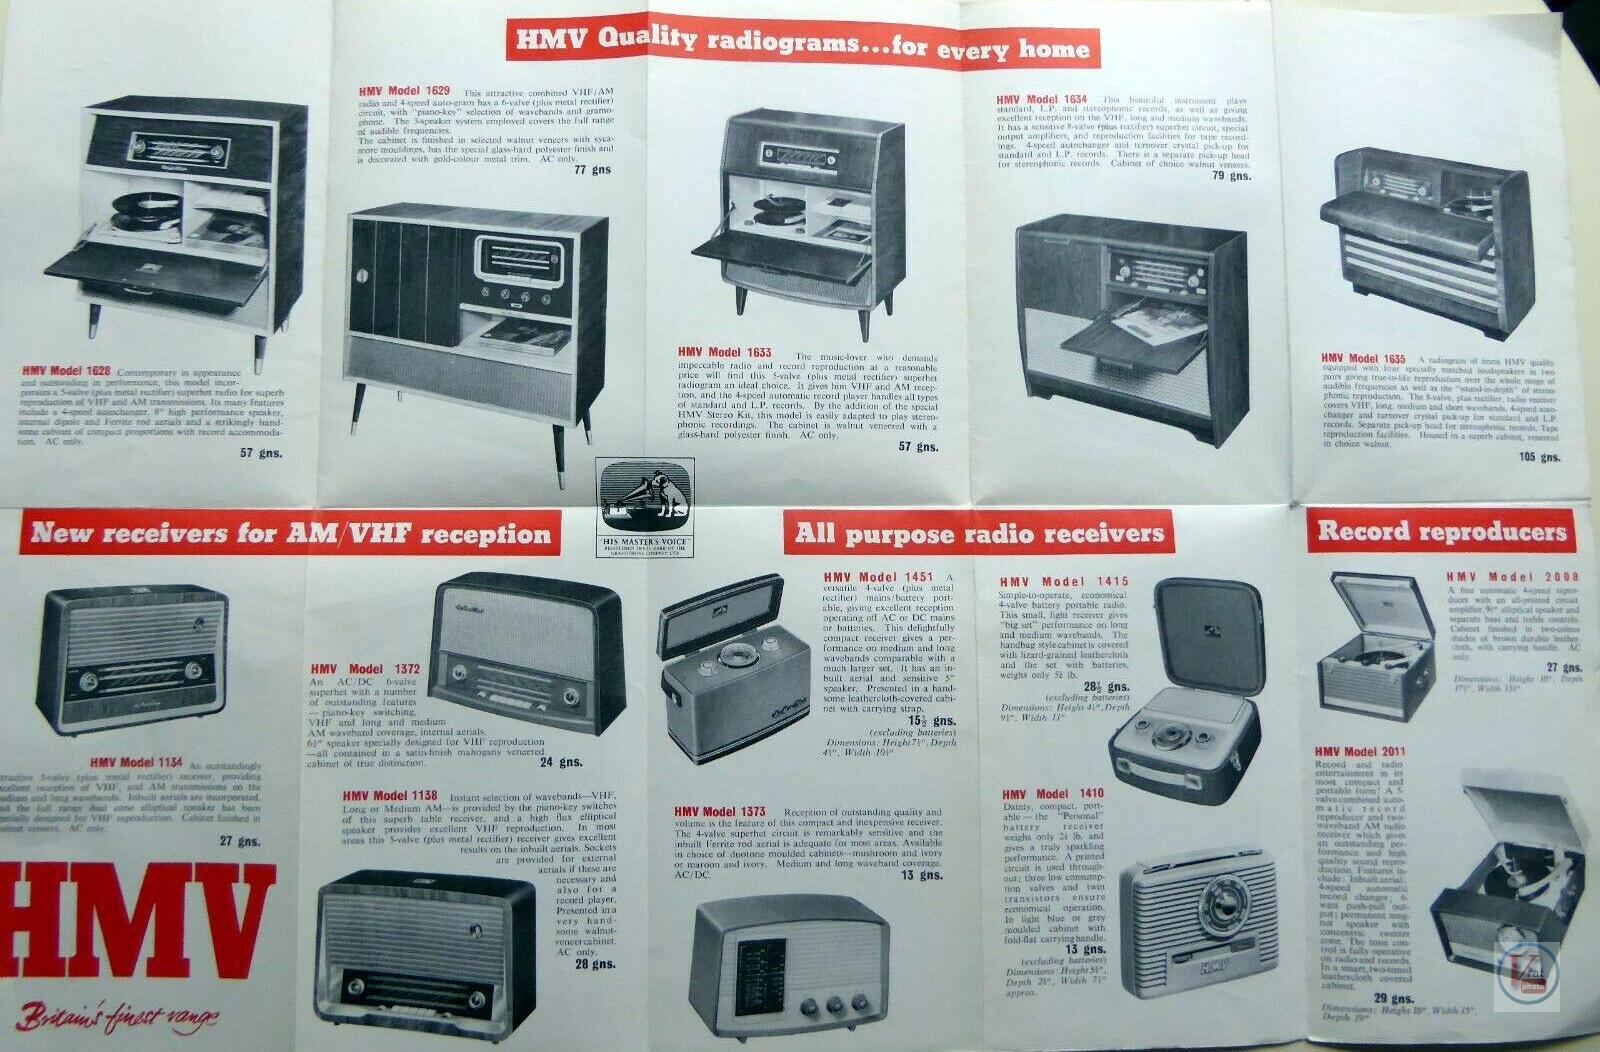 HMV Radios 2